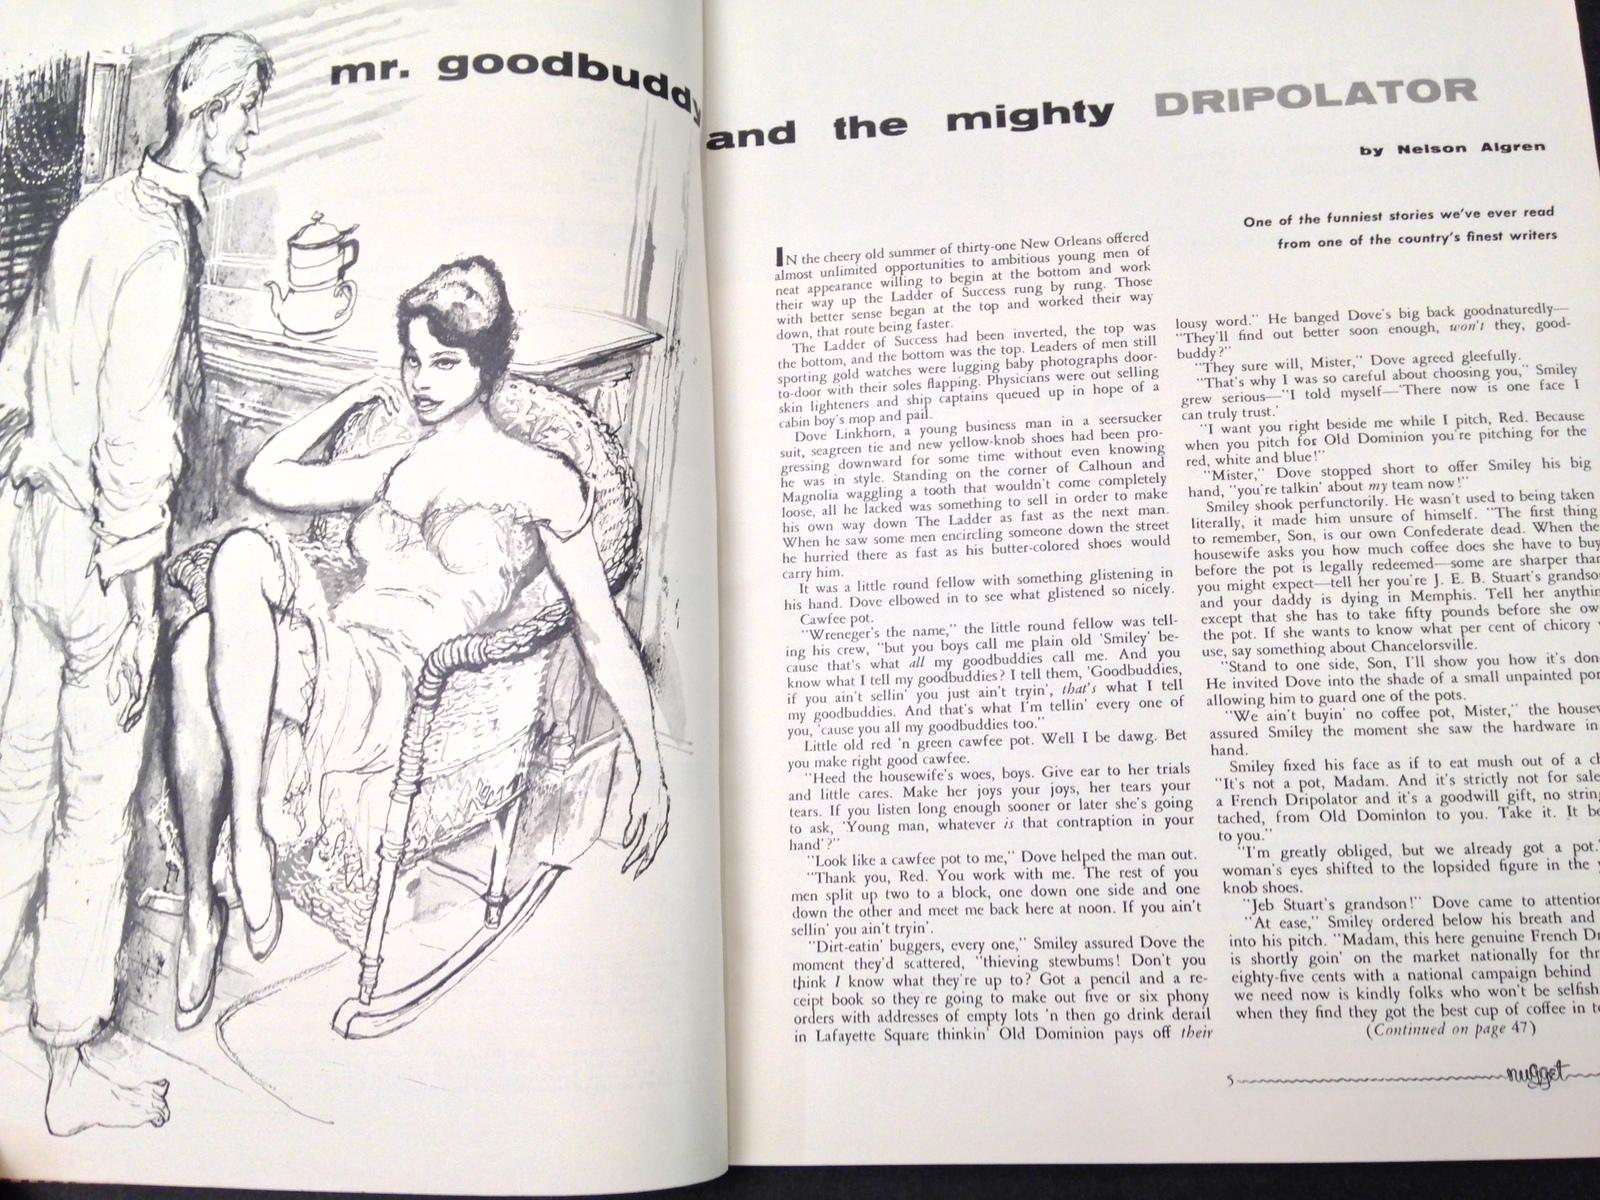 Nugget Men's Magazine Volume 1 Number 4 July 1956